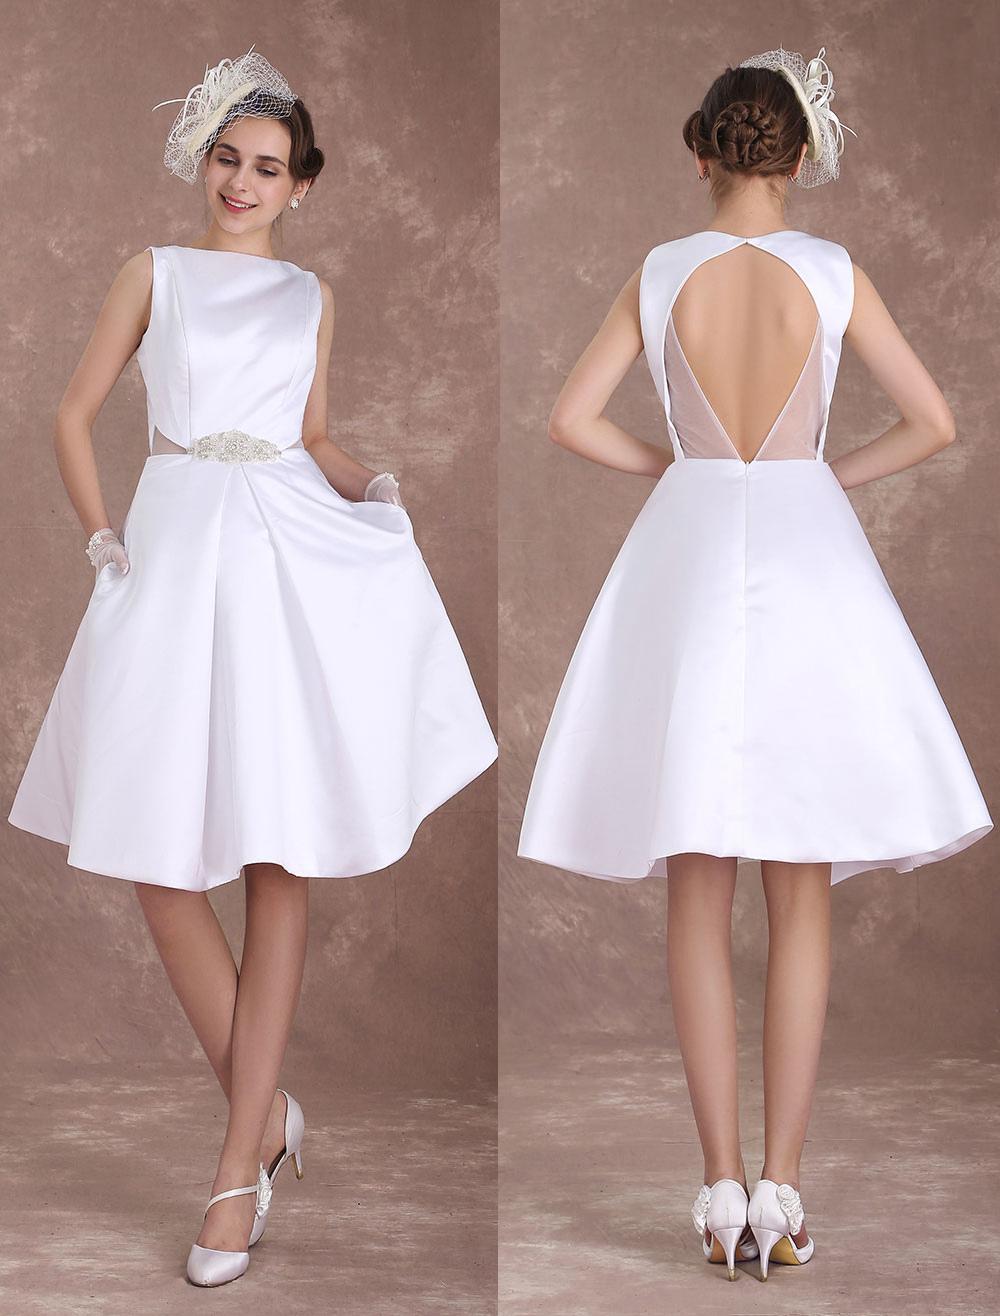 White Wedding Dresses Short Bridal Dress Vintage 1950's Satin Backless Bateau Beaded Knee Length Wedding Reception Dress Milanoo photo